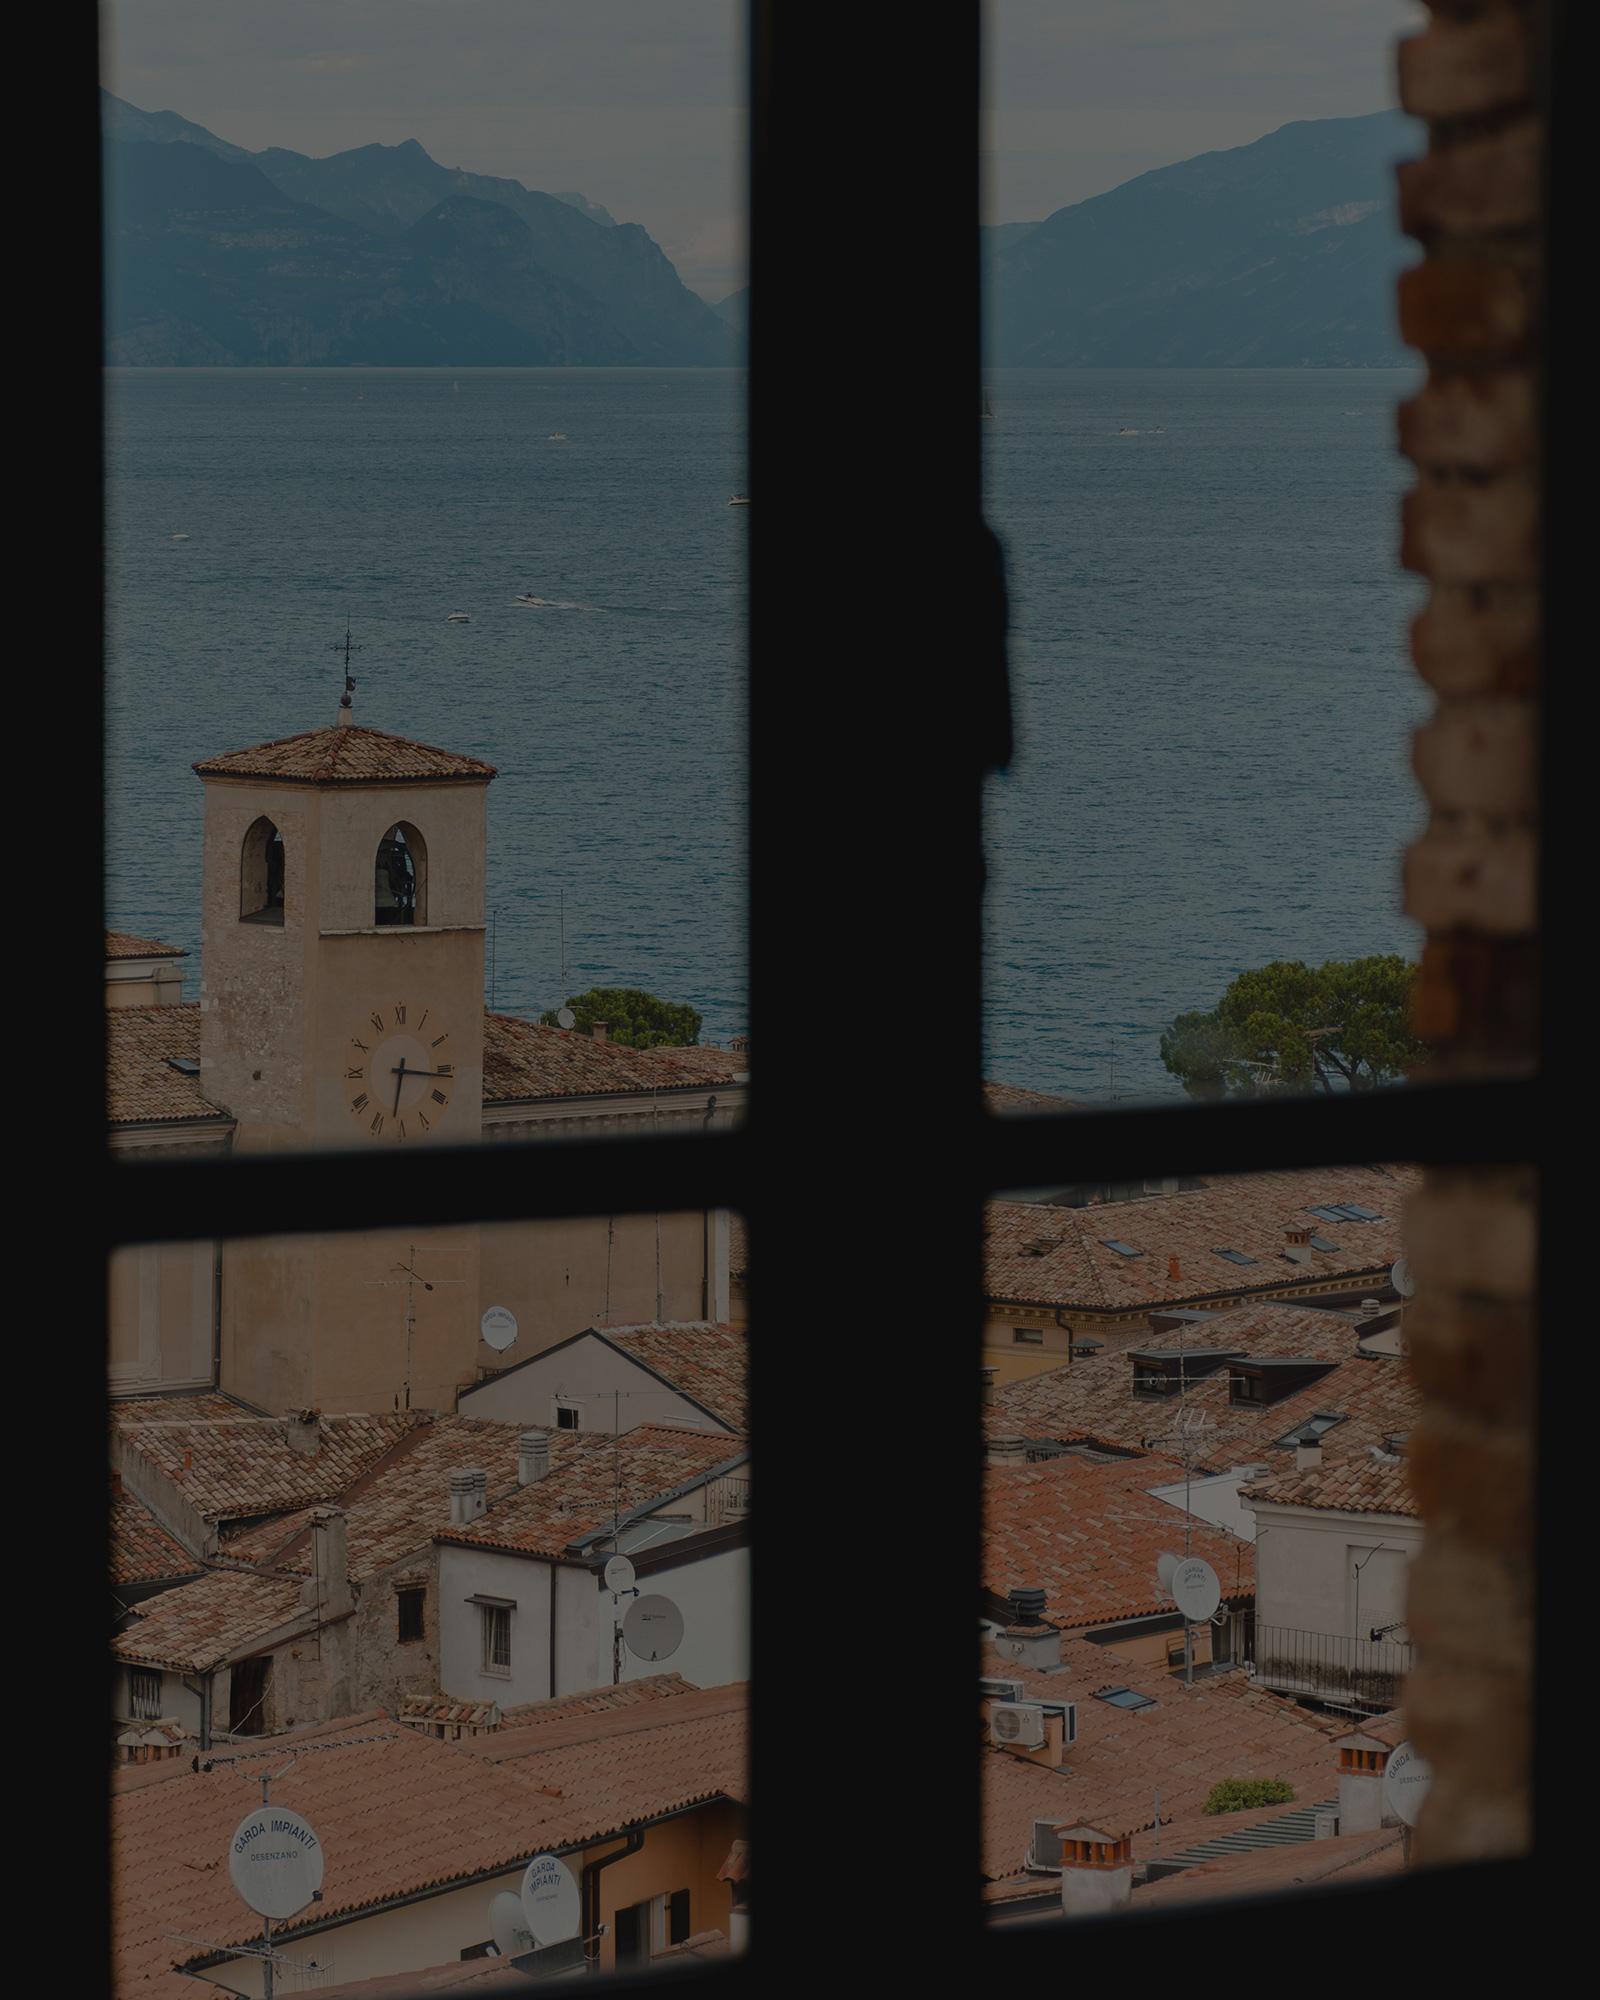 ITALY~LOMBARDY: MILAN, LAKE COMO, FRANCIACORTA, & LAKE GARDA -